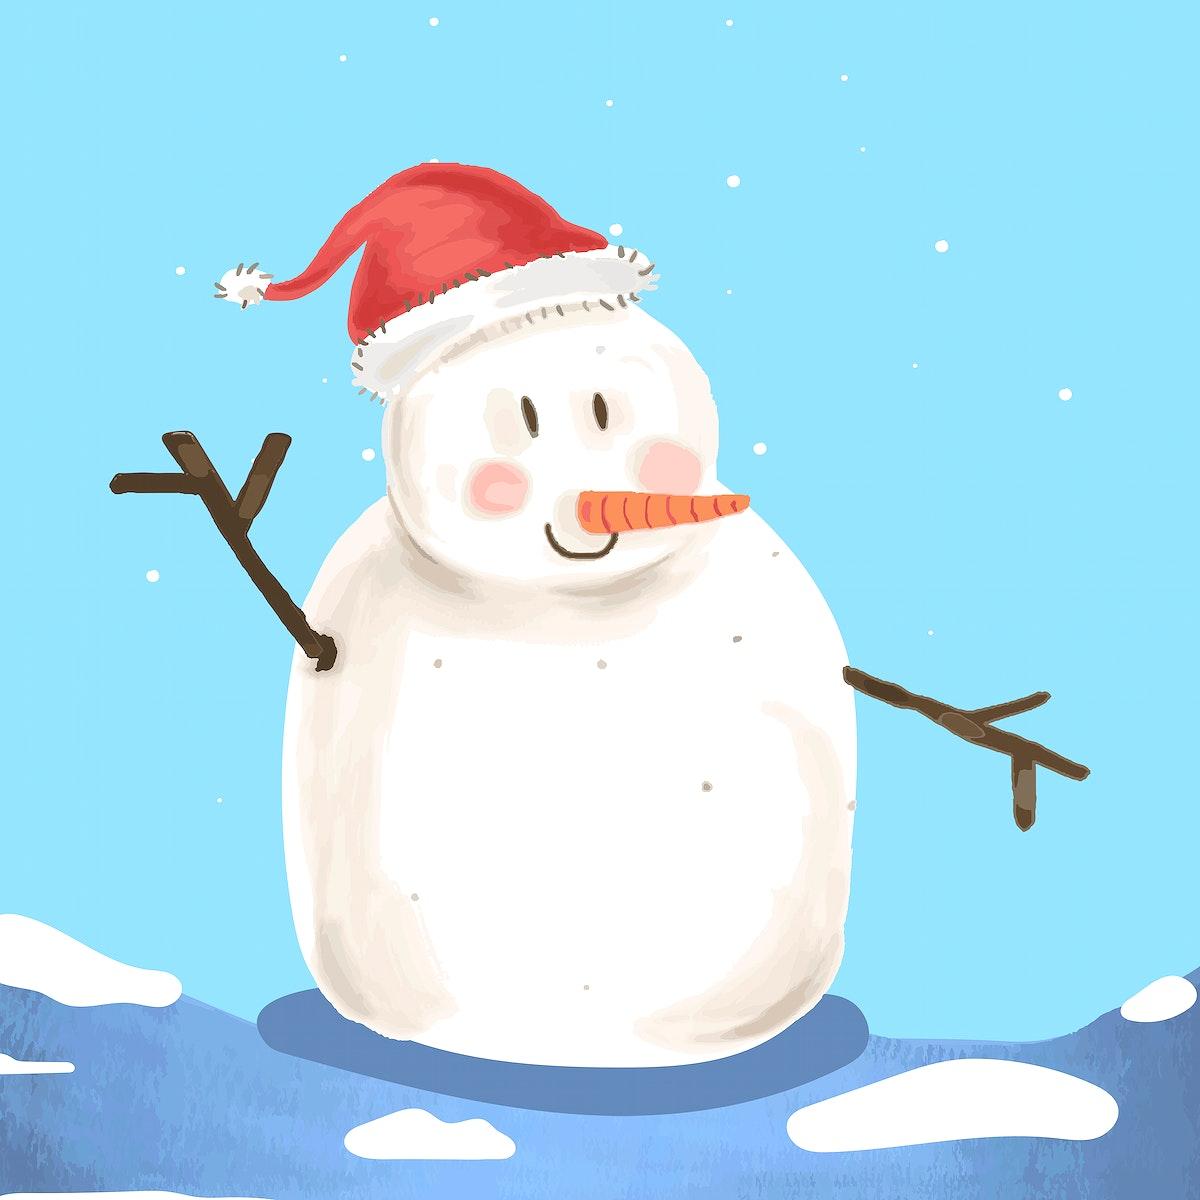 Cute Snowman Christmas element illustration